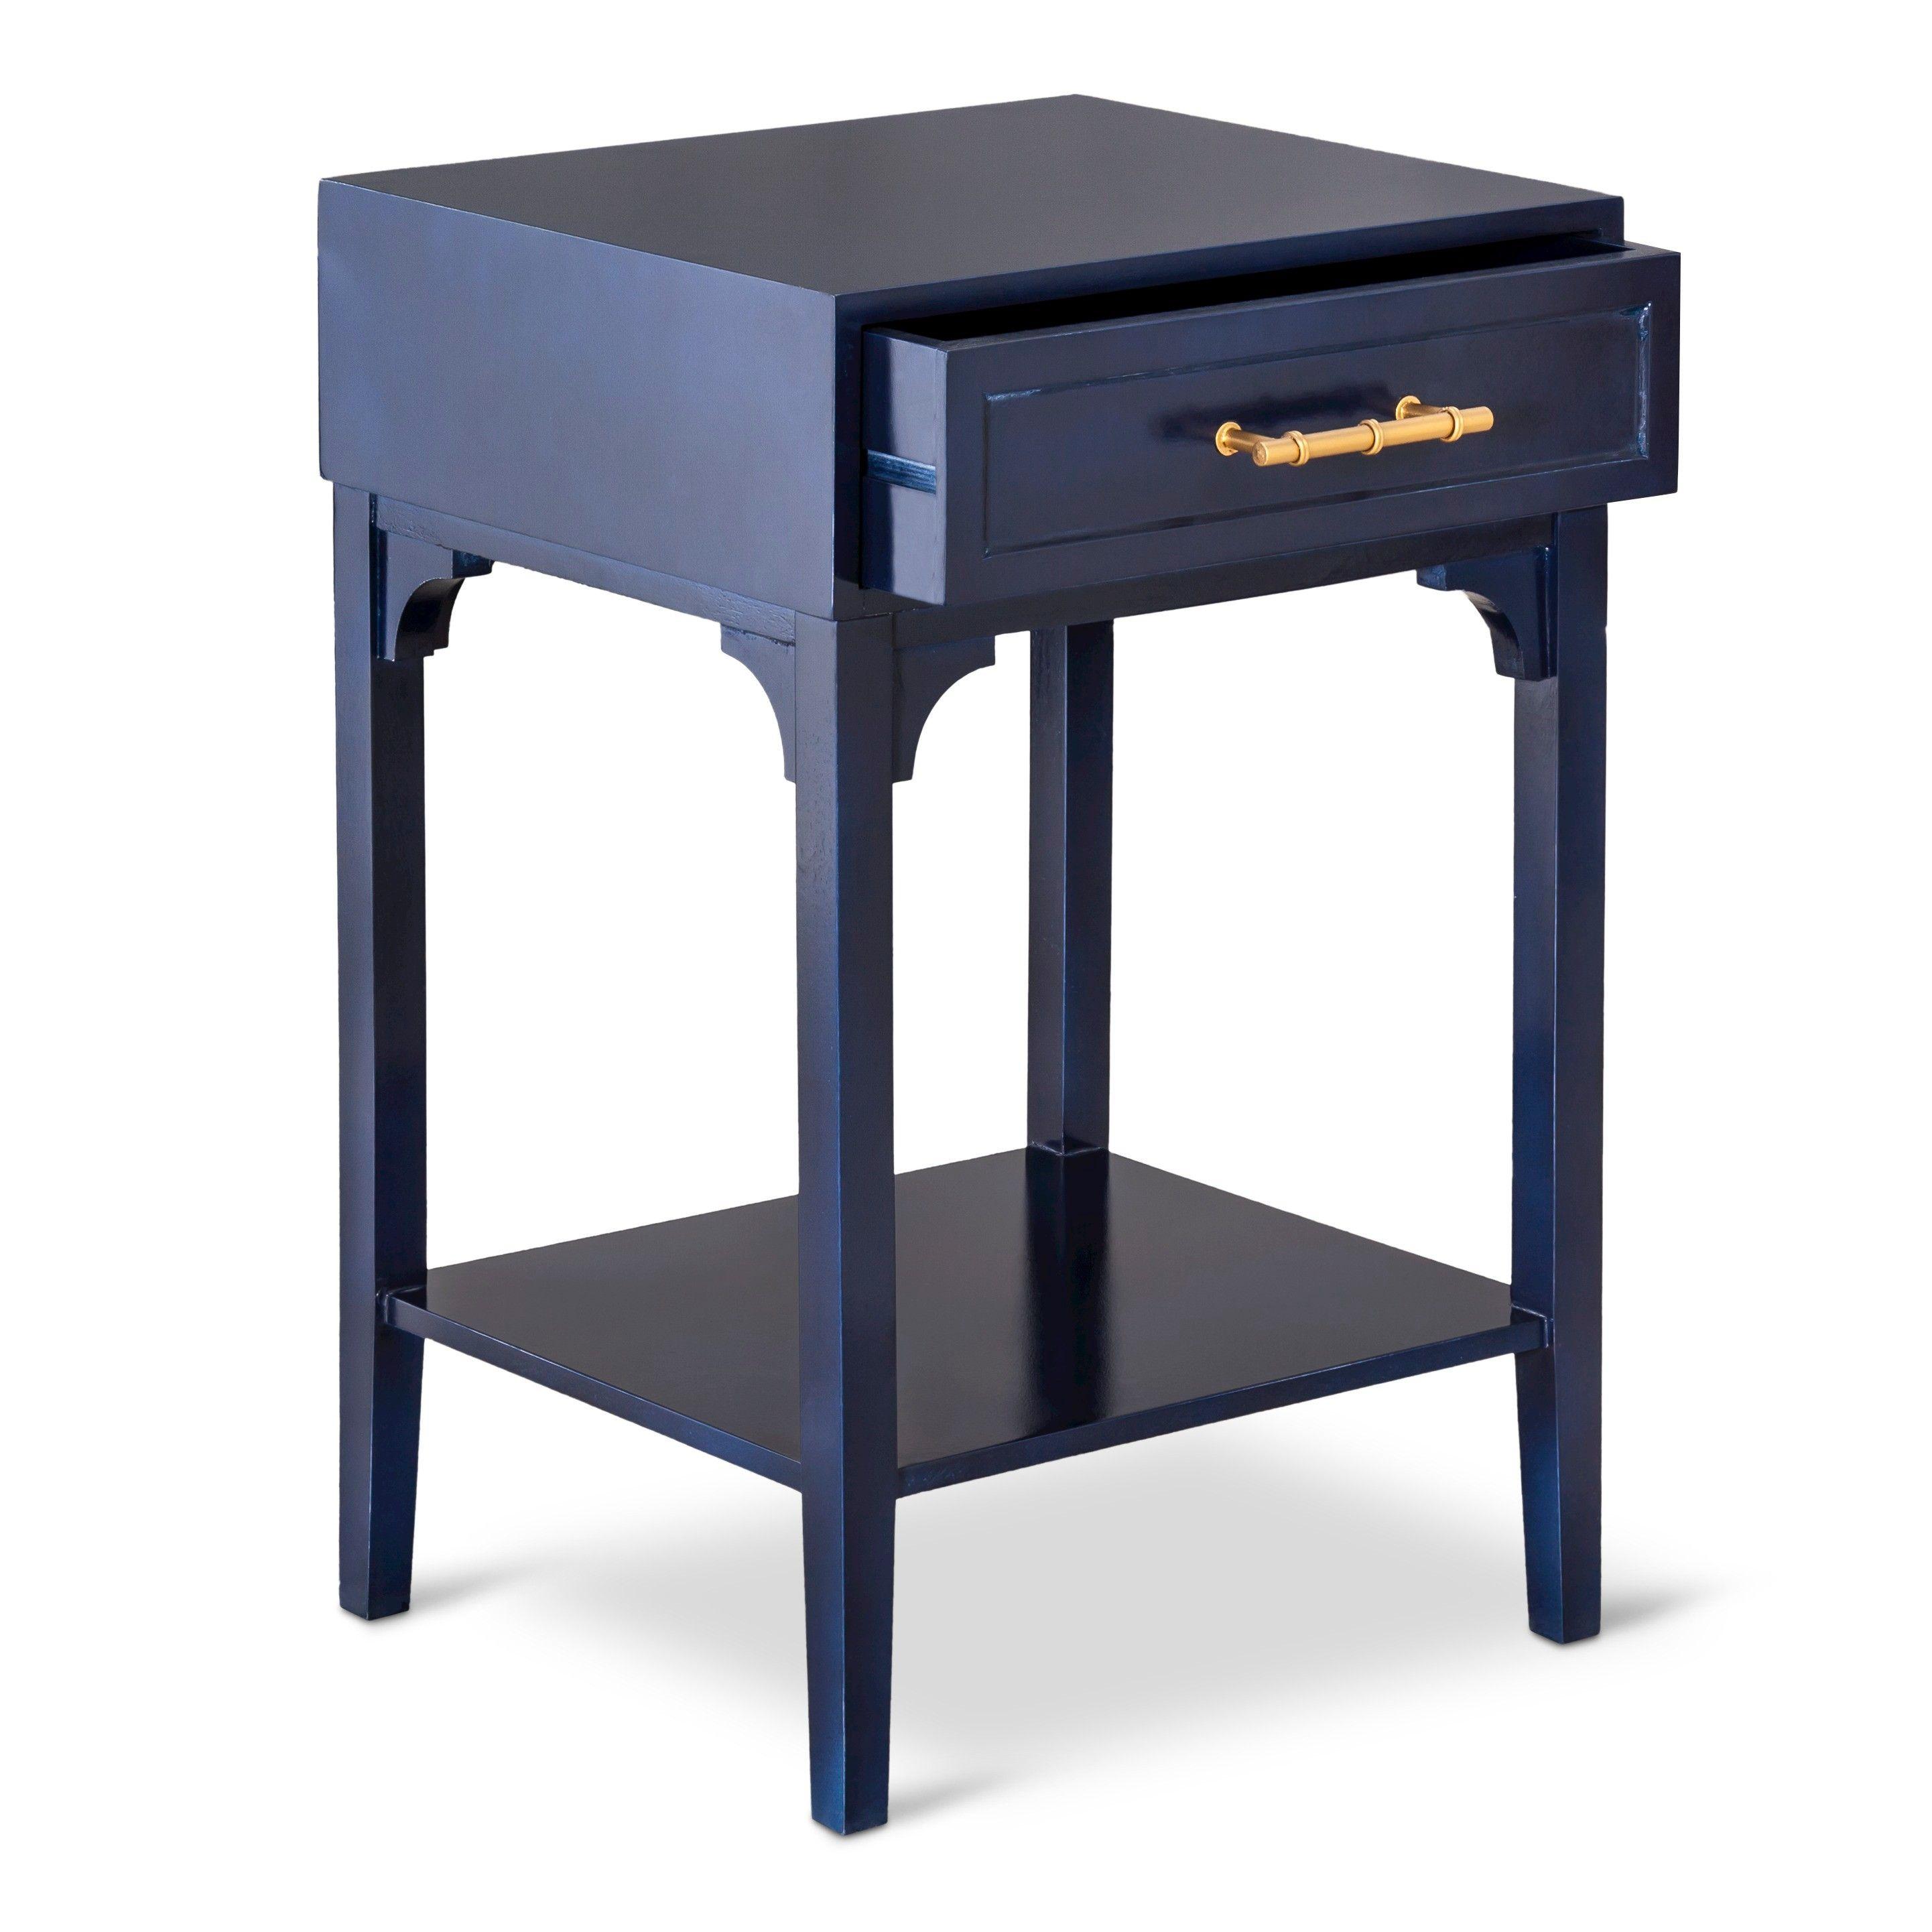 threshold accent table with bamboo motif handle target loft wine rack below acrylic occasional tables sliding barn door ergonomic furniture grey outdoor coffee best bedroom